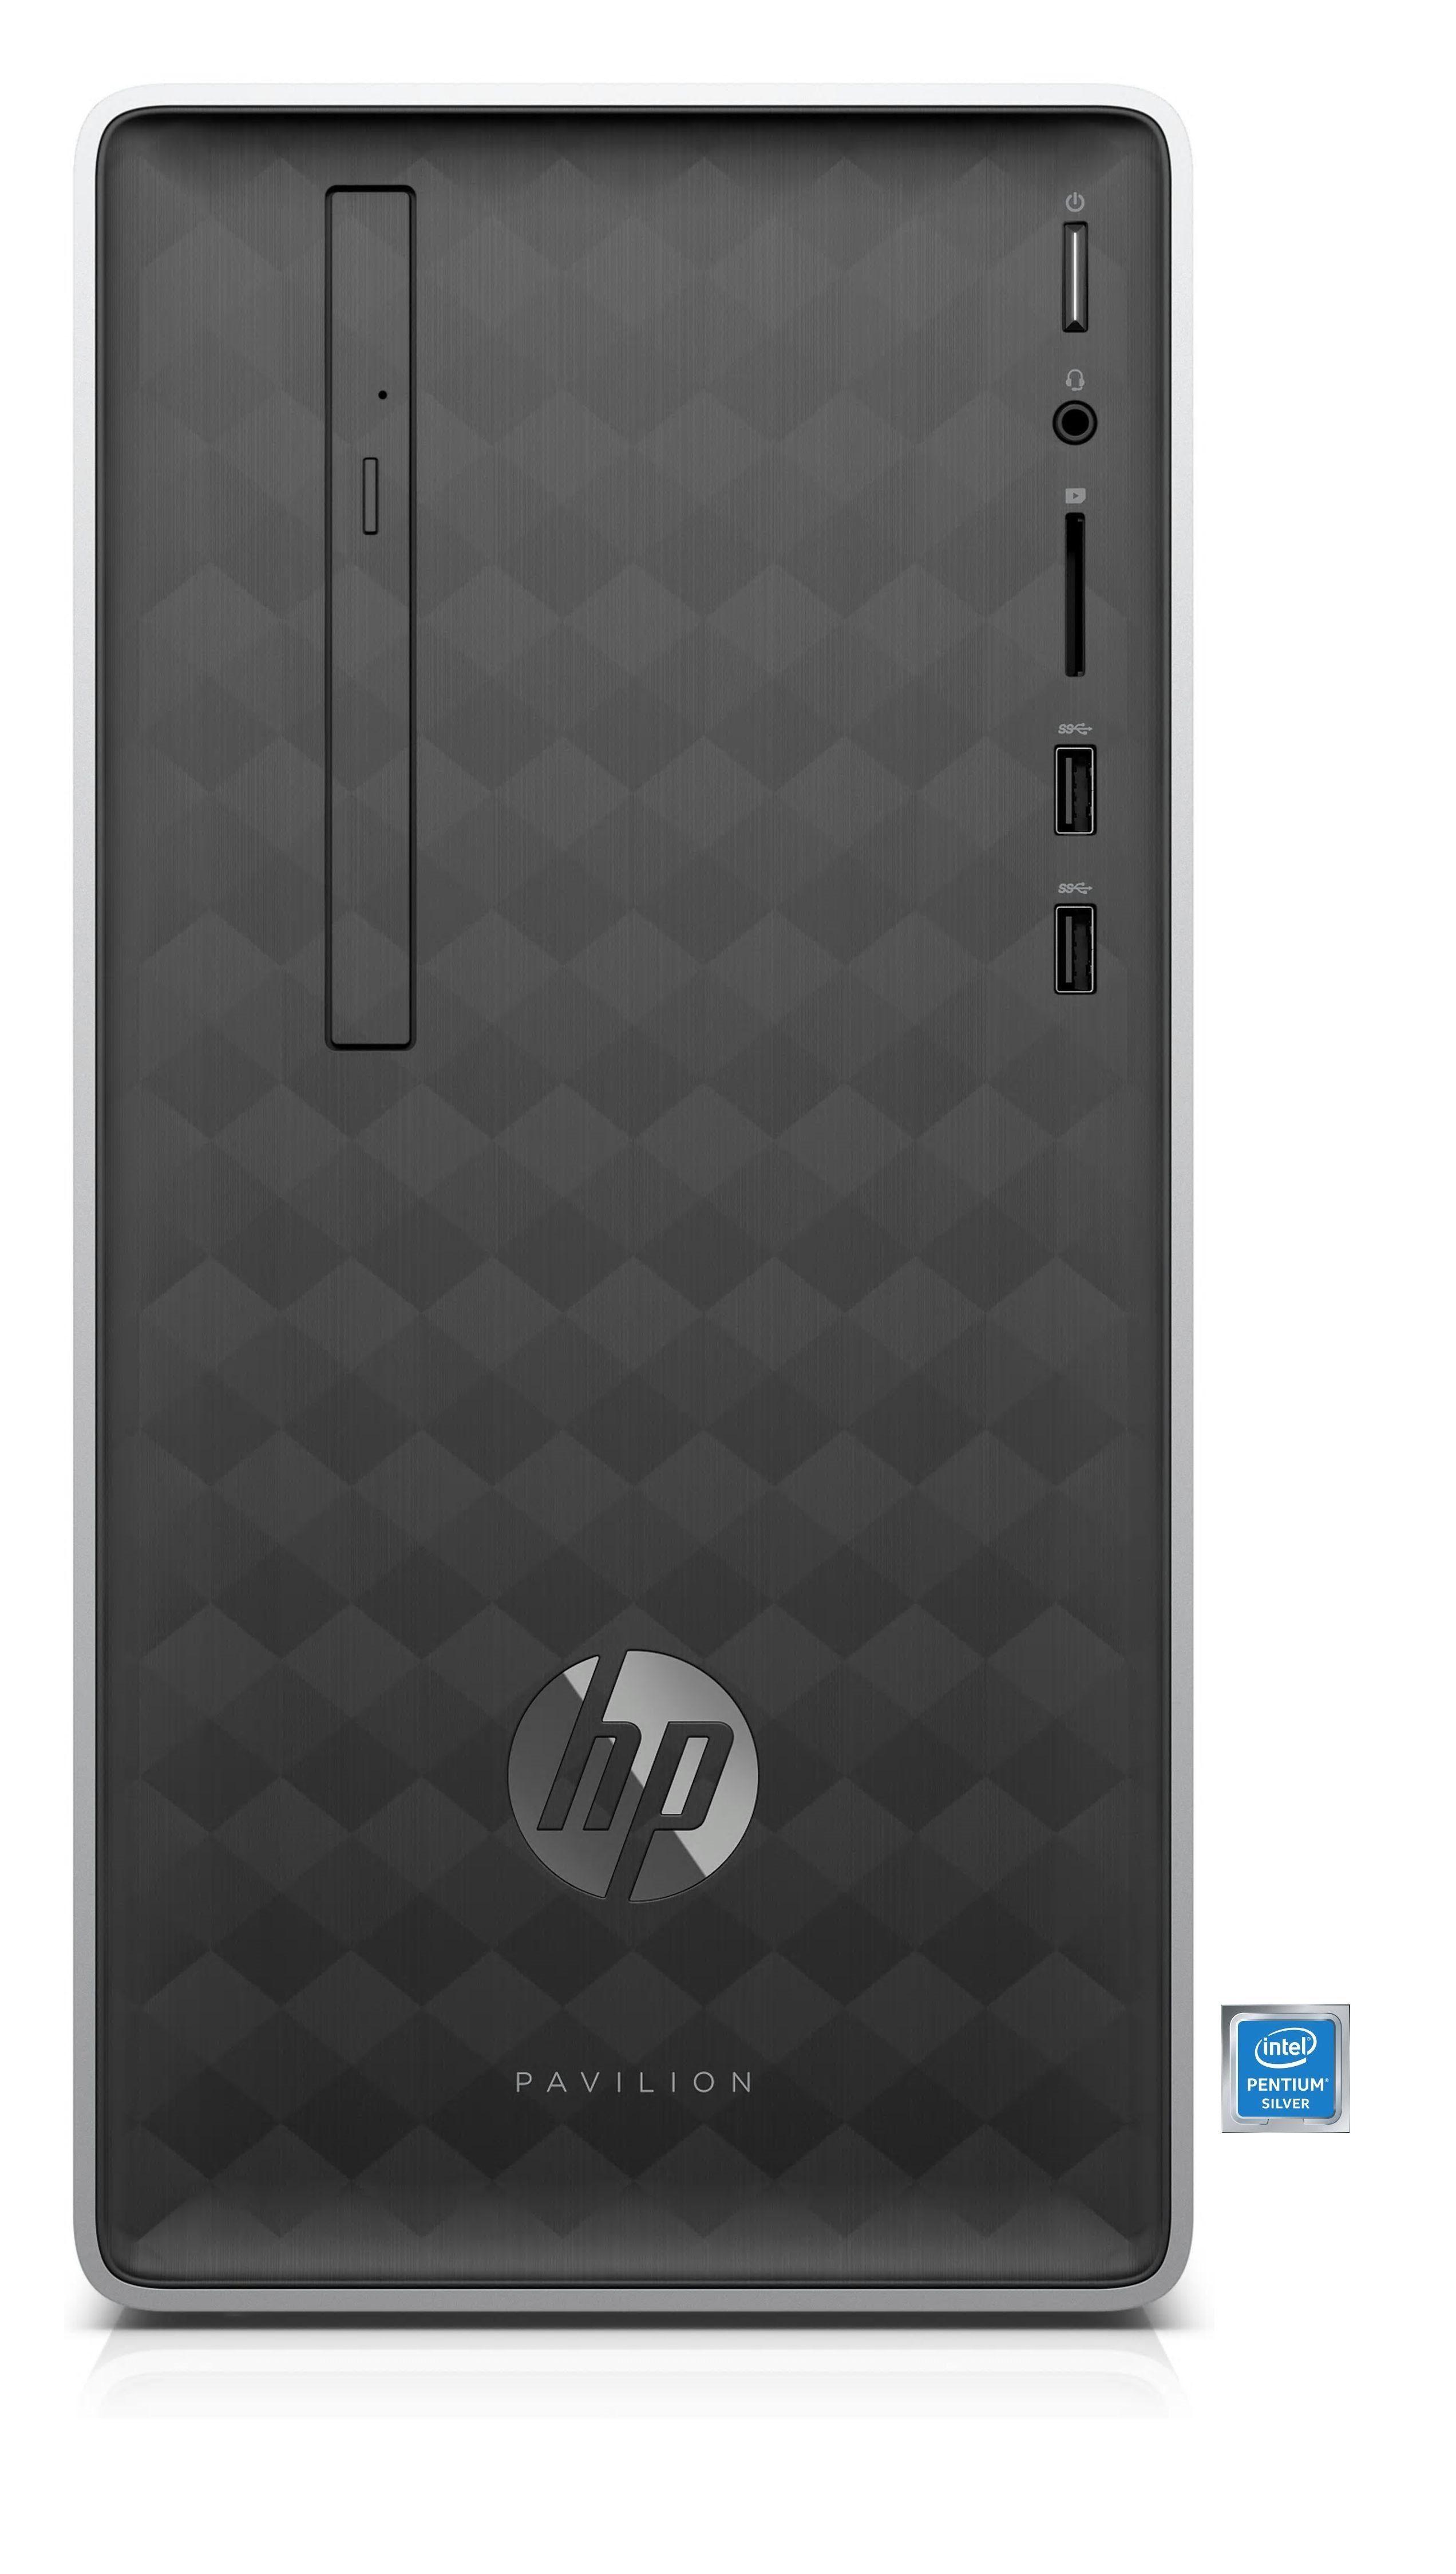 HP Pavilion 590-a0508ng Desktop PC »Intel Pentium Silver,Intel UHD 600, 1 TB, 8 GB«